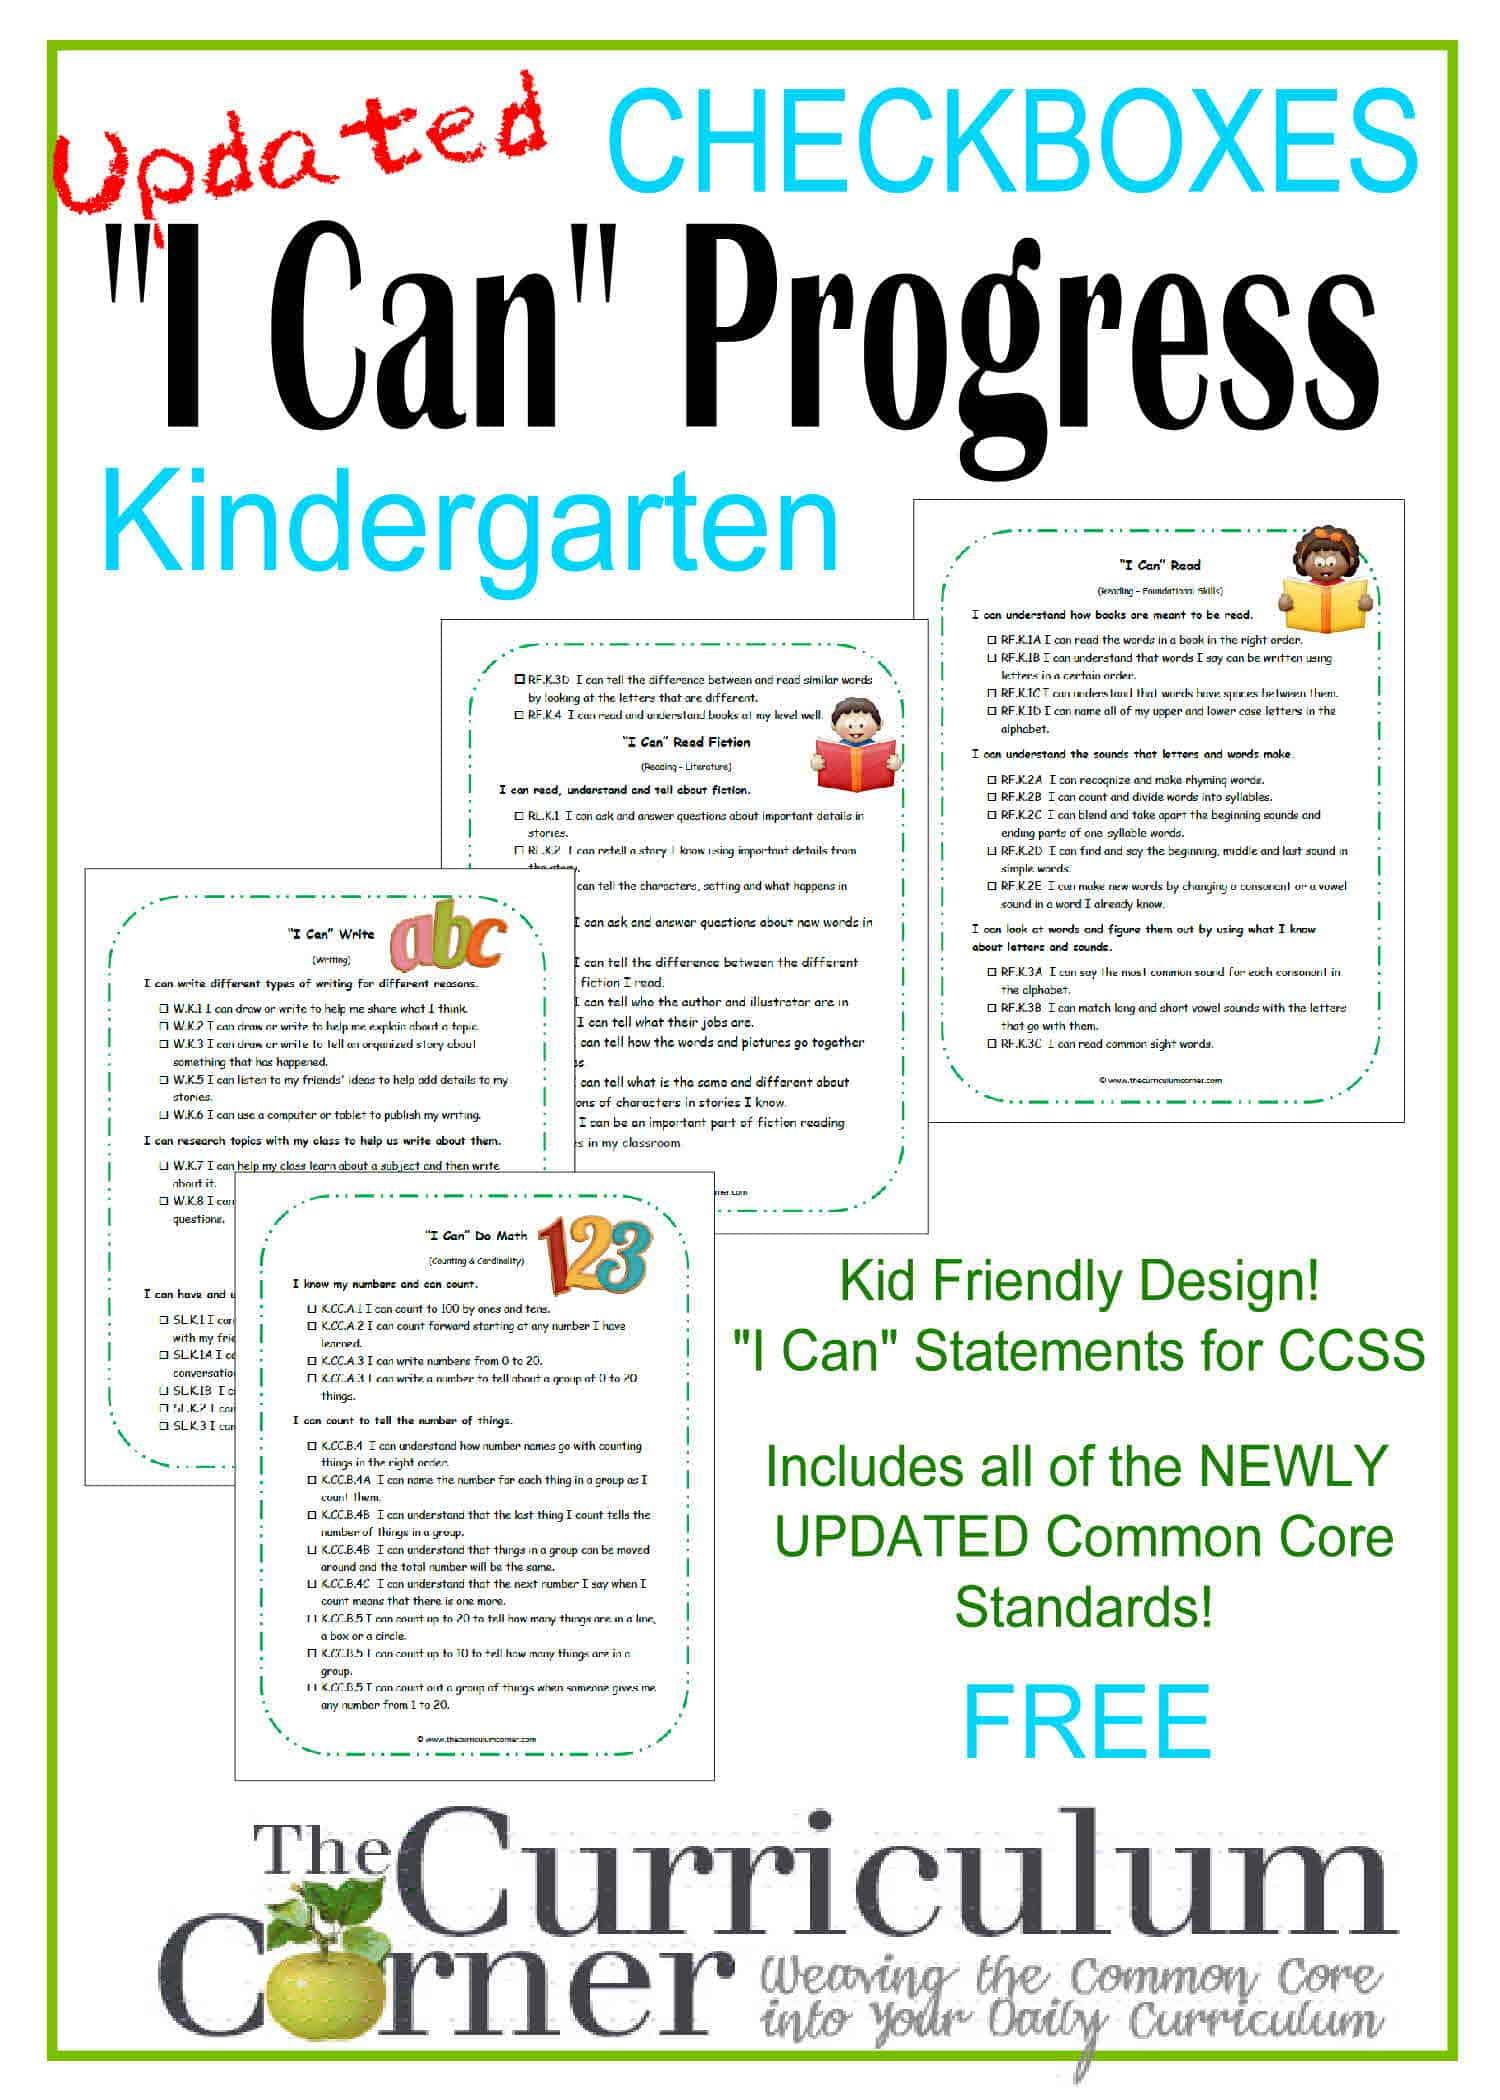 Kid Clip Art I Can Statements Kindergarten Ccss Checkboxes